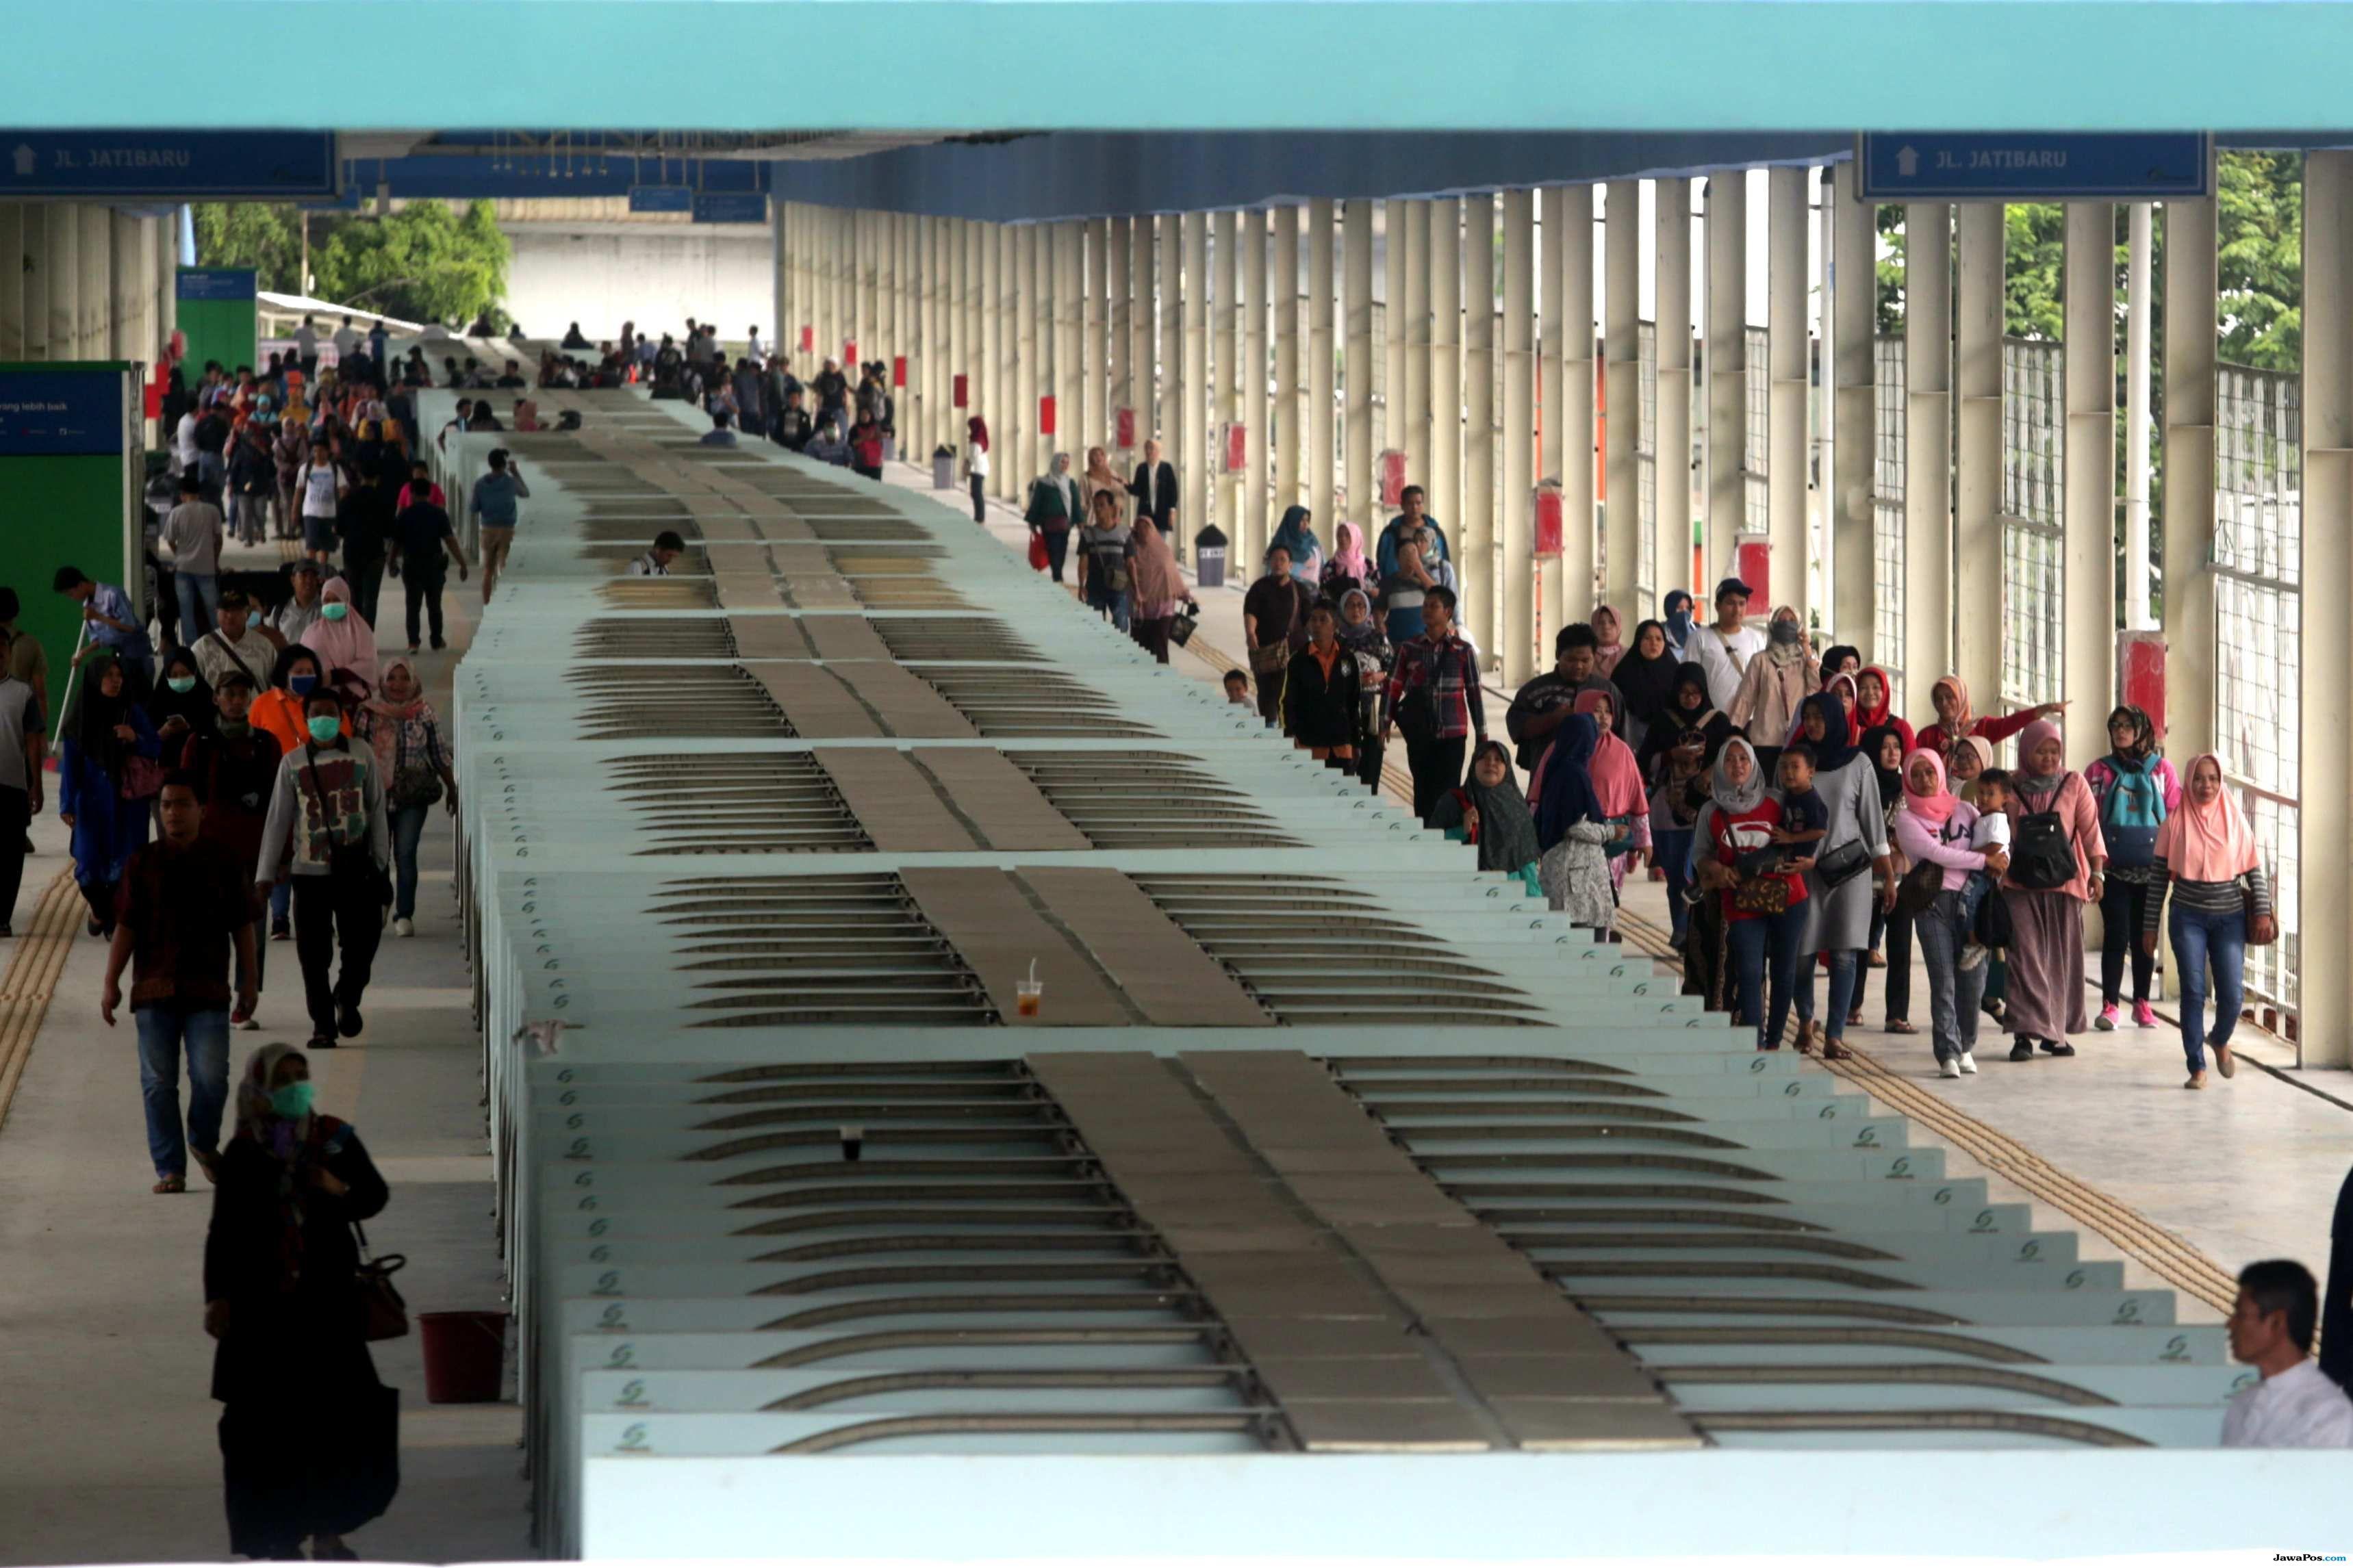 Pantau Sirkulasi Pejalan Kaki, Skybridge Tanah Abang Diuji Coba